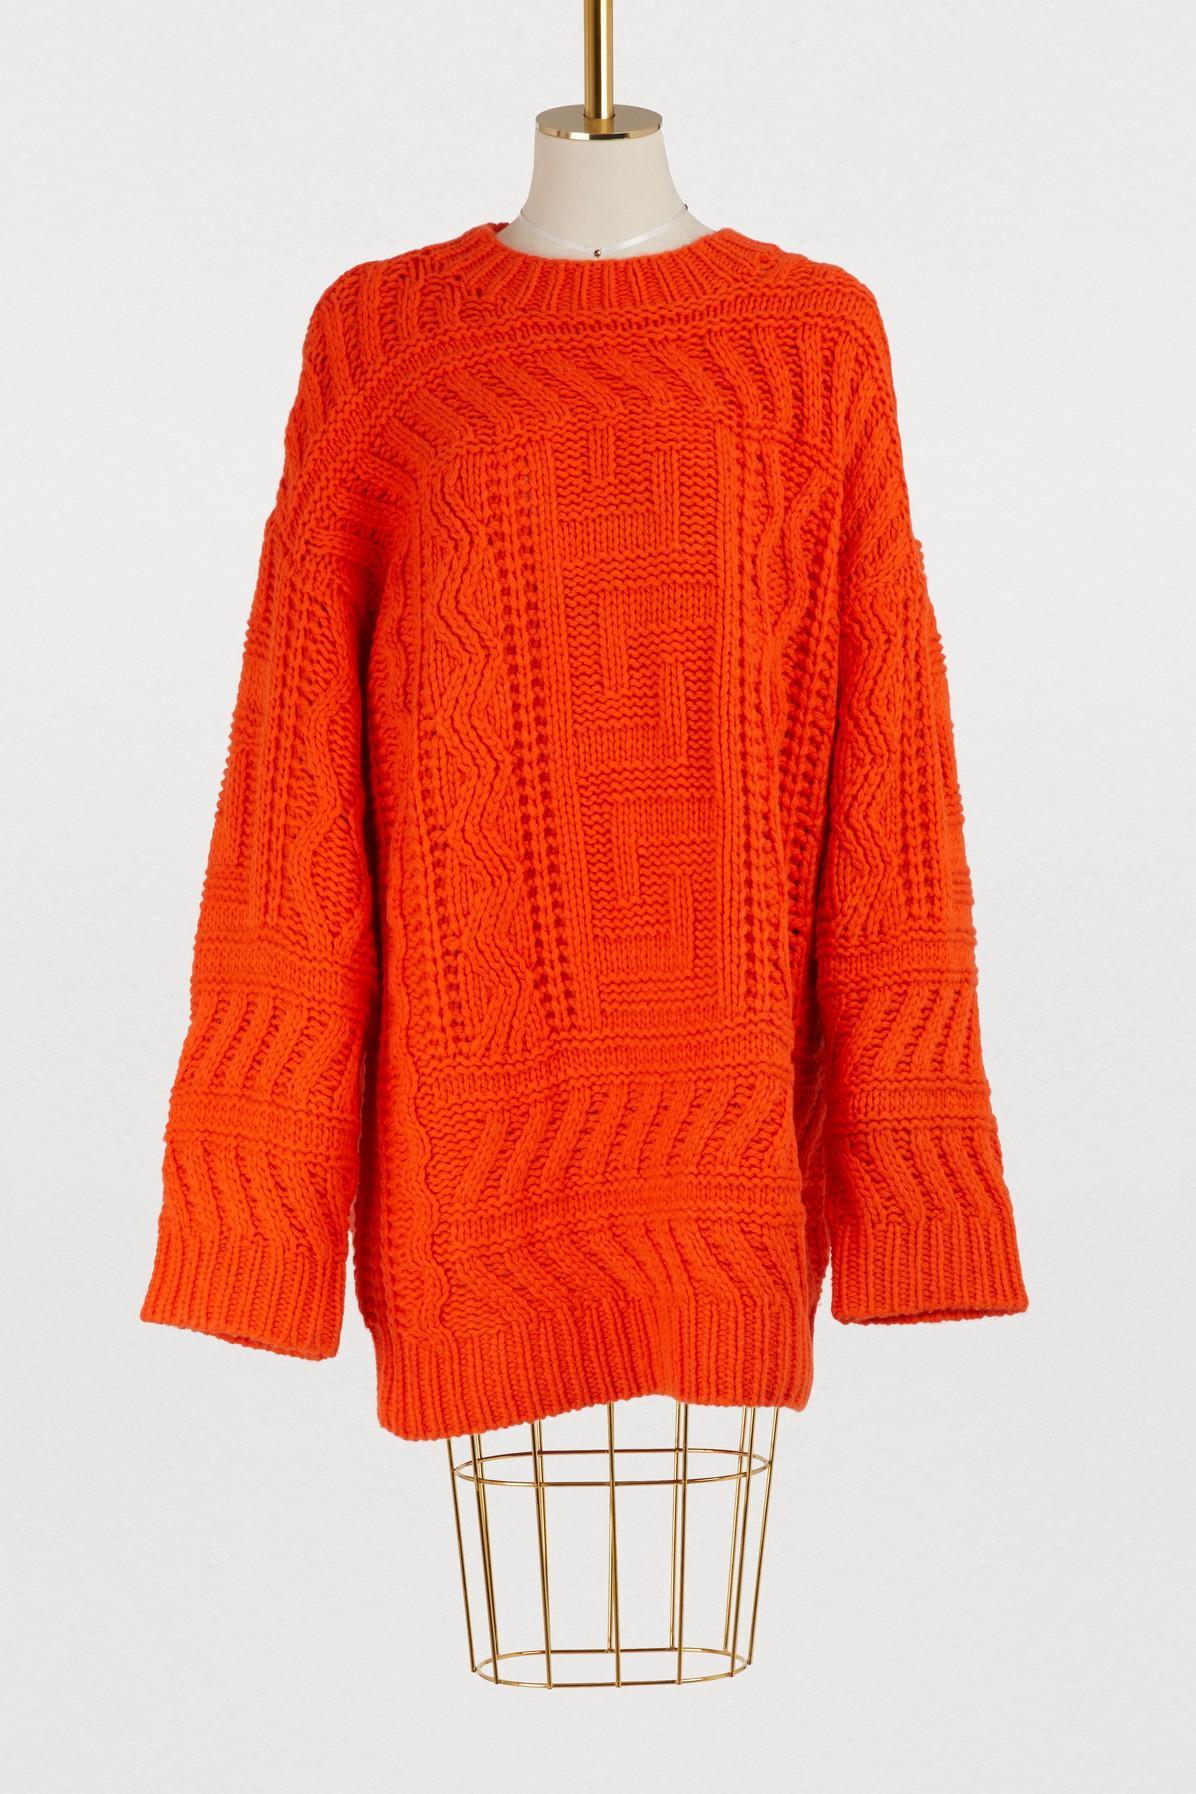 Etudes Studio Larry Oversized Sweater In Orange